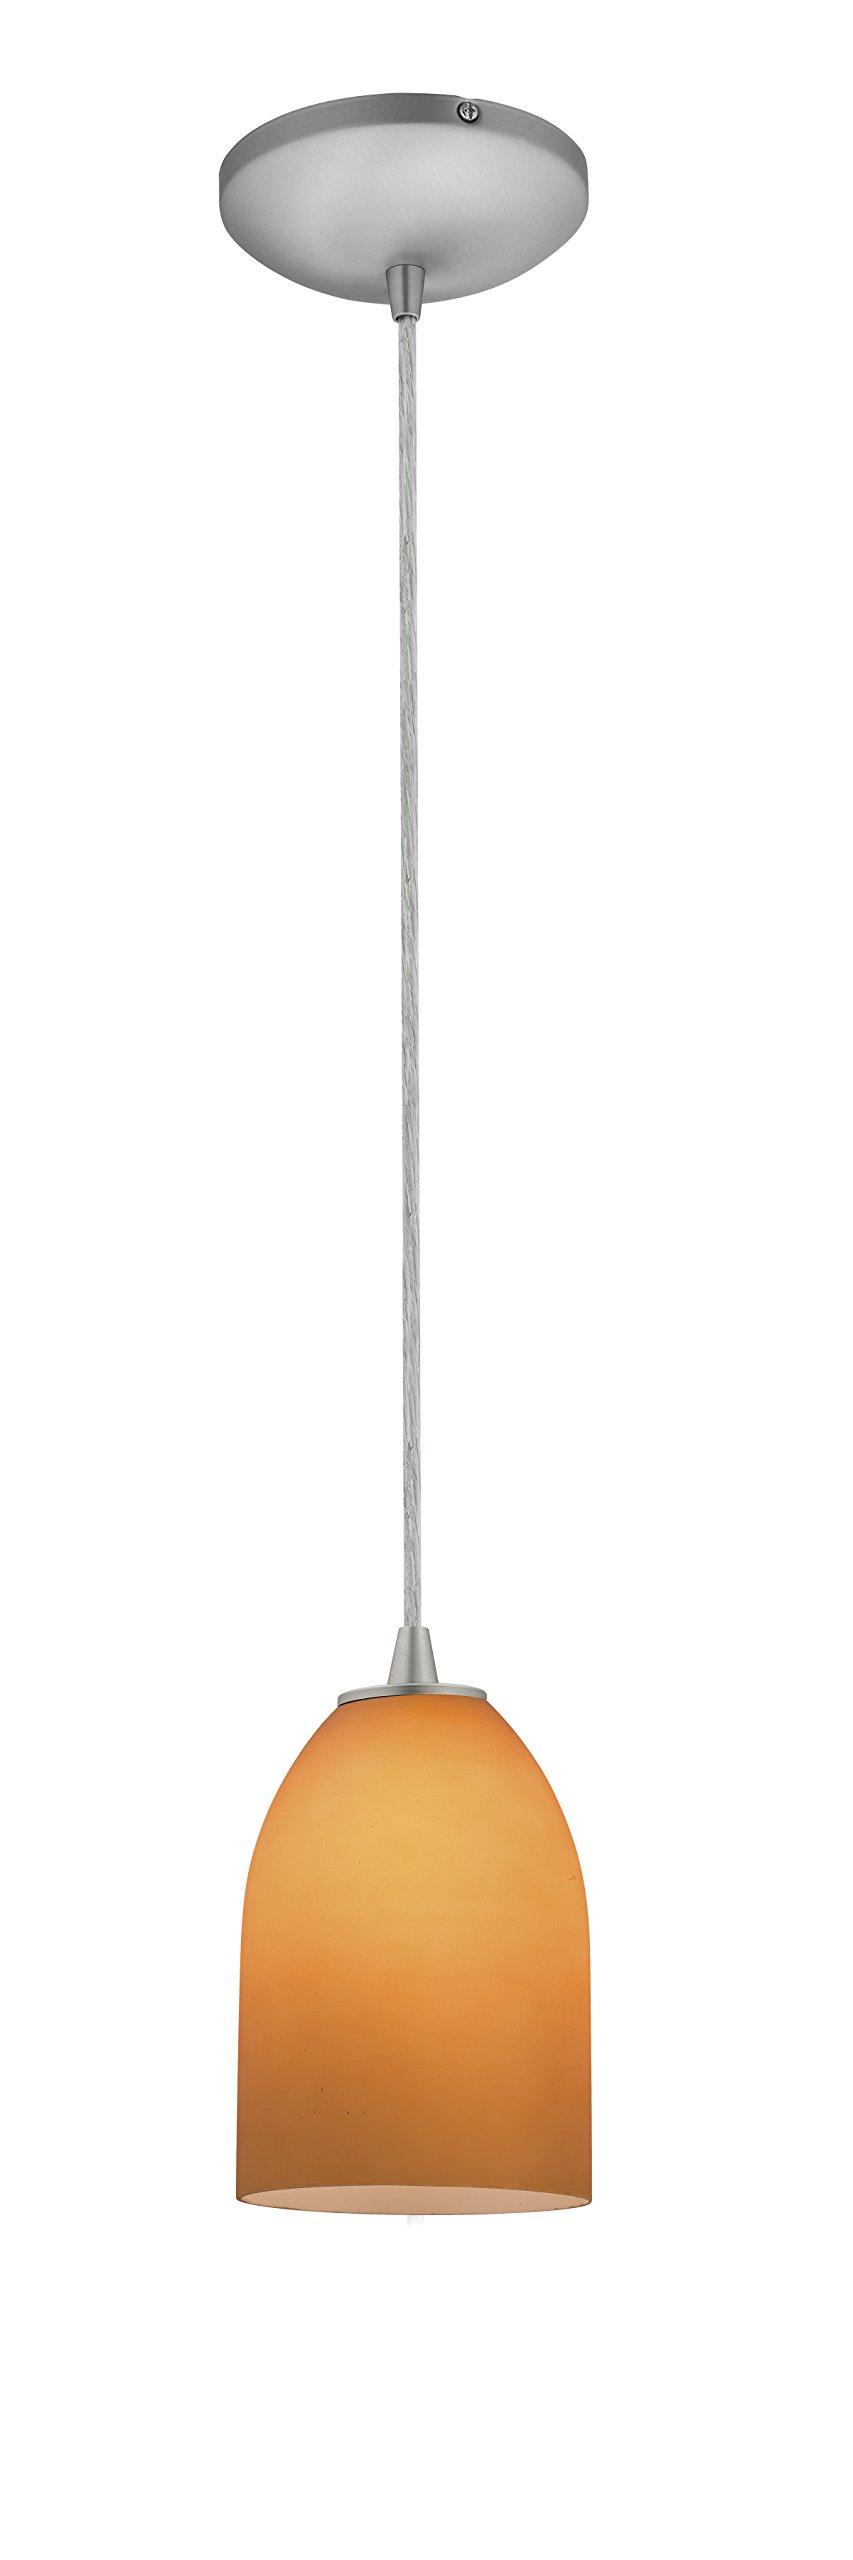 Bordeaux Glass Pendant - 1-Light Pendant - Cord - Brushed Steel Finish - Amber Glass Shade